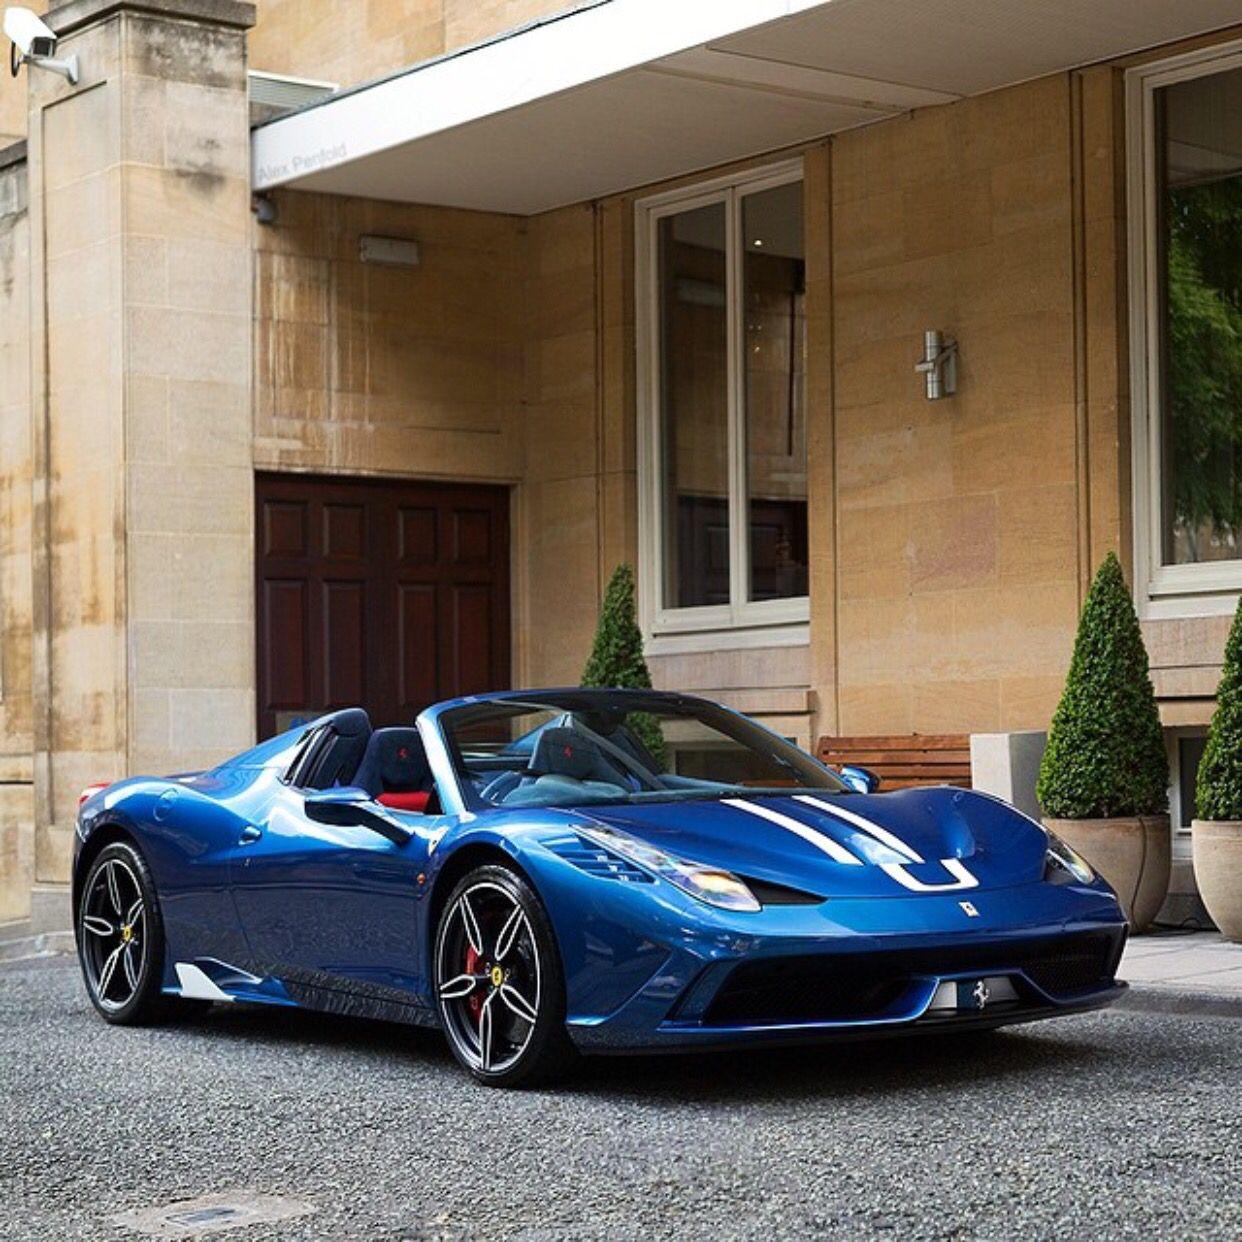 Ferrari 458 Speciale: Ferrari 458 Speciale Aperta Painted In Tour De France Blue